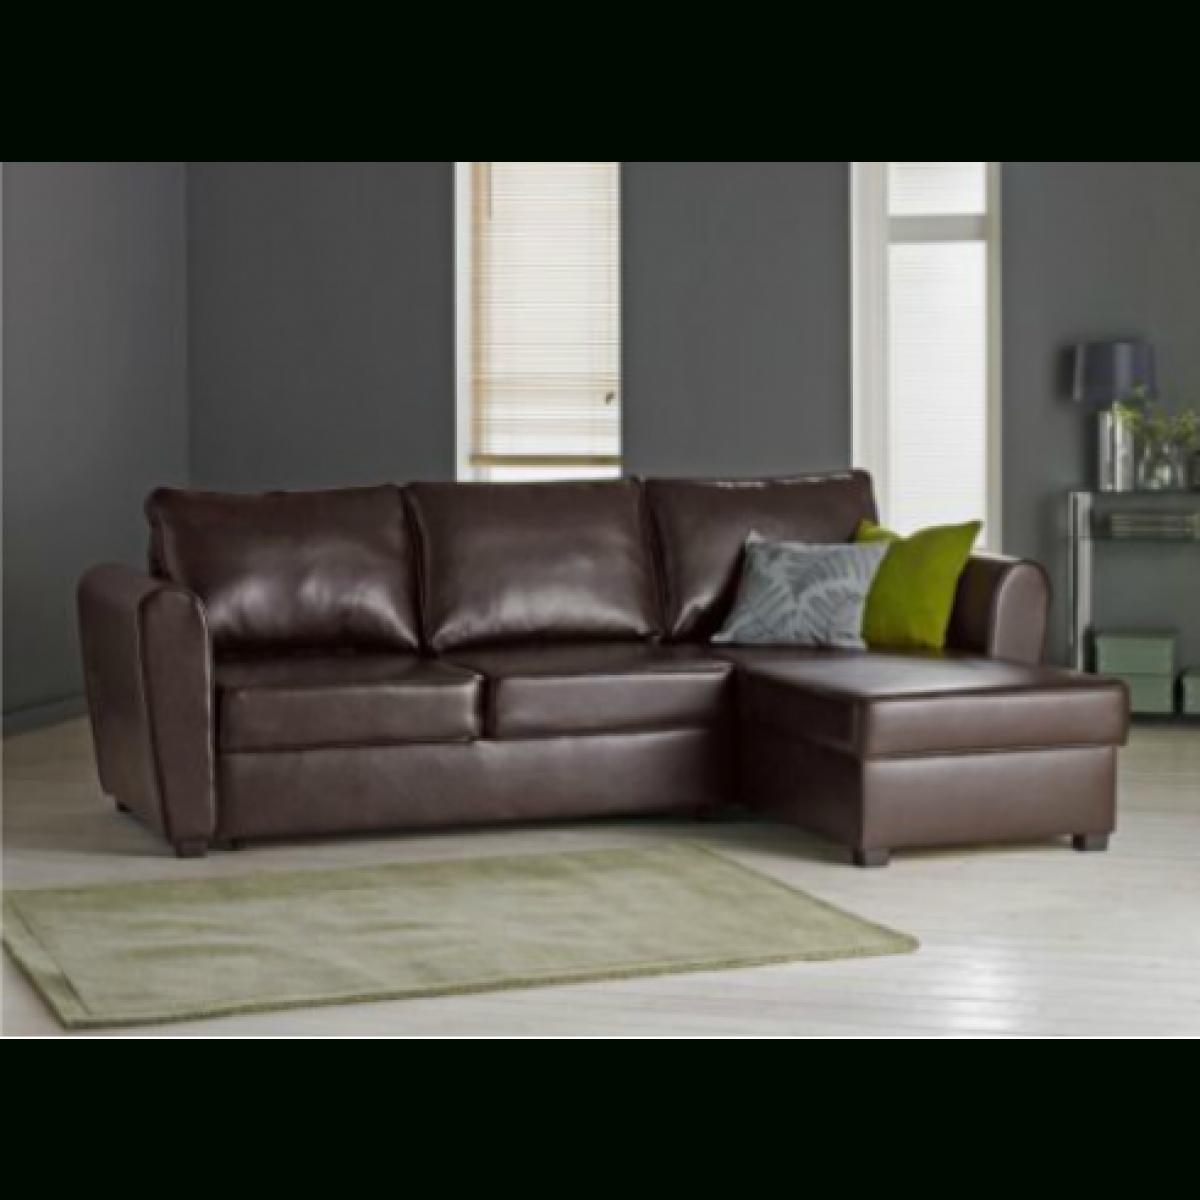 New Siena Fabric Corner Sofa Bed With Storage – Charcoal Pertaining To Fabric Corner Sofa Bed (Image 15 of 20)